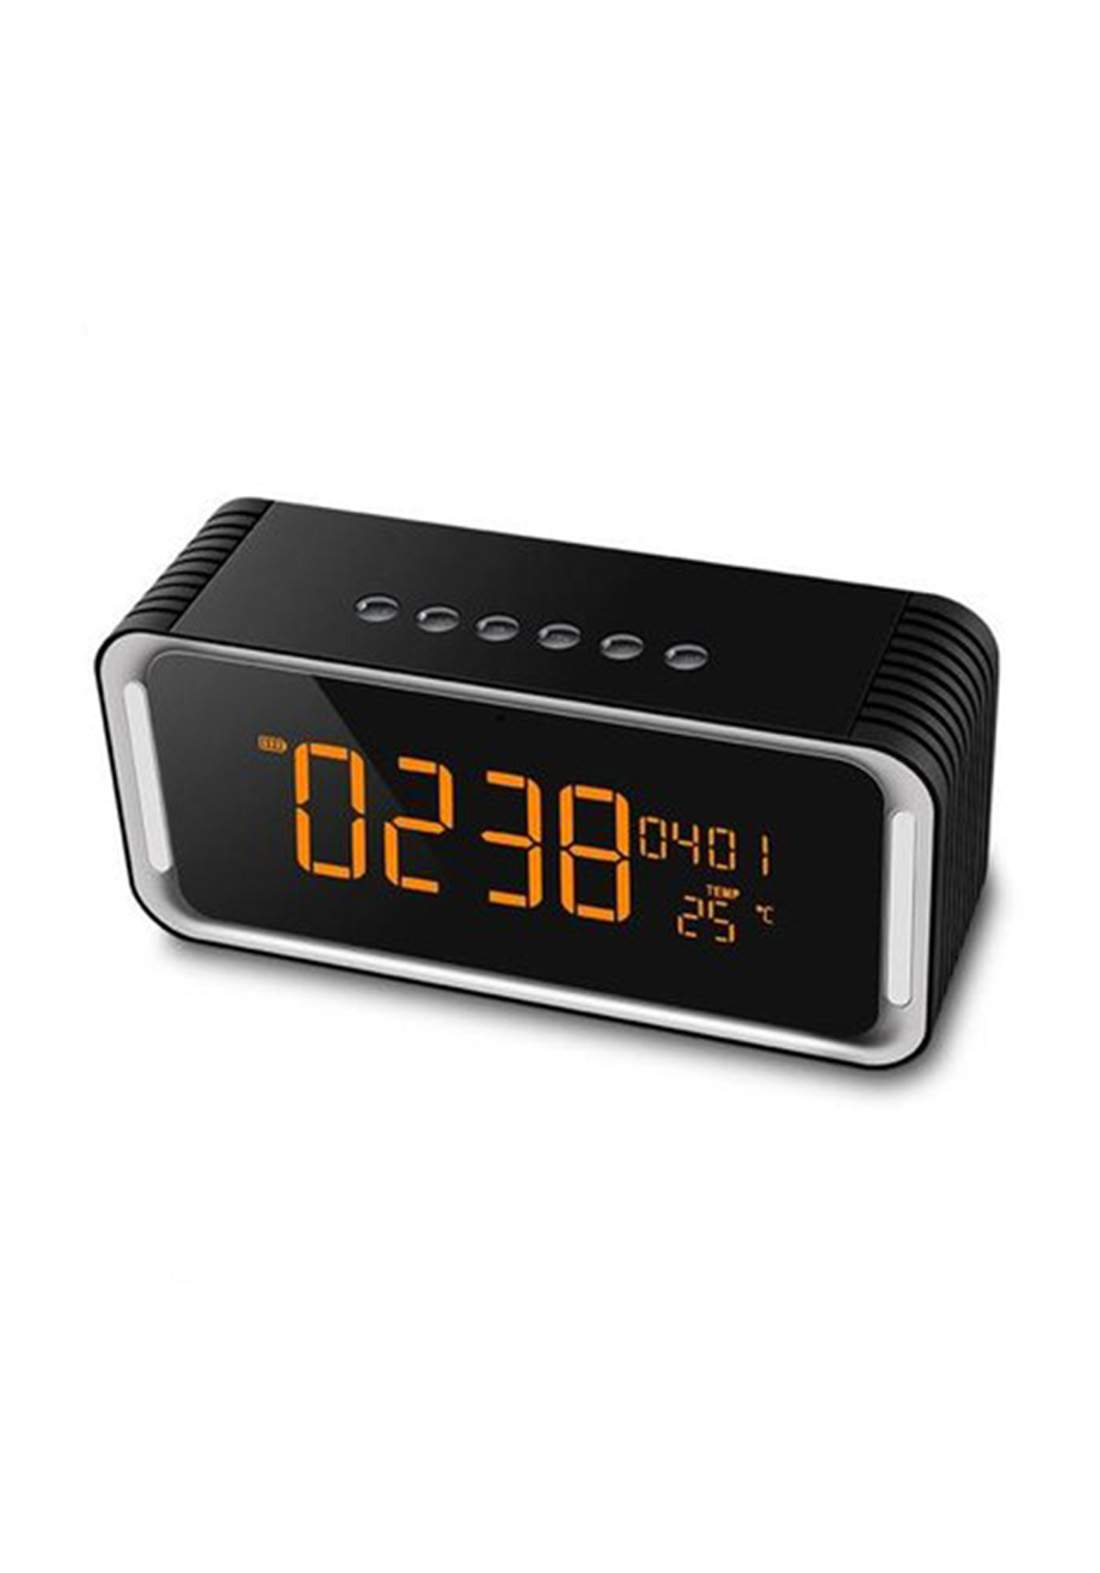 Musky DY-33 Bluetooth Speaker  - Black  مكبر صوت